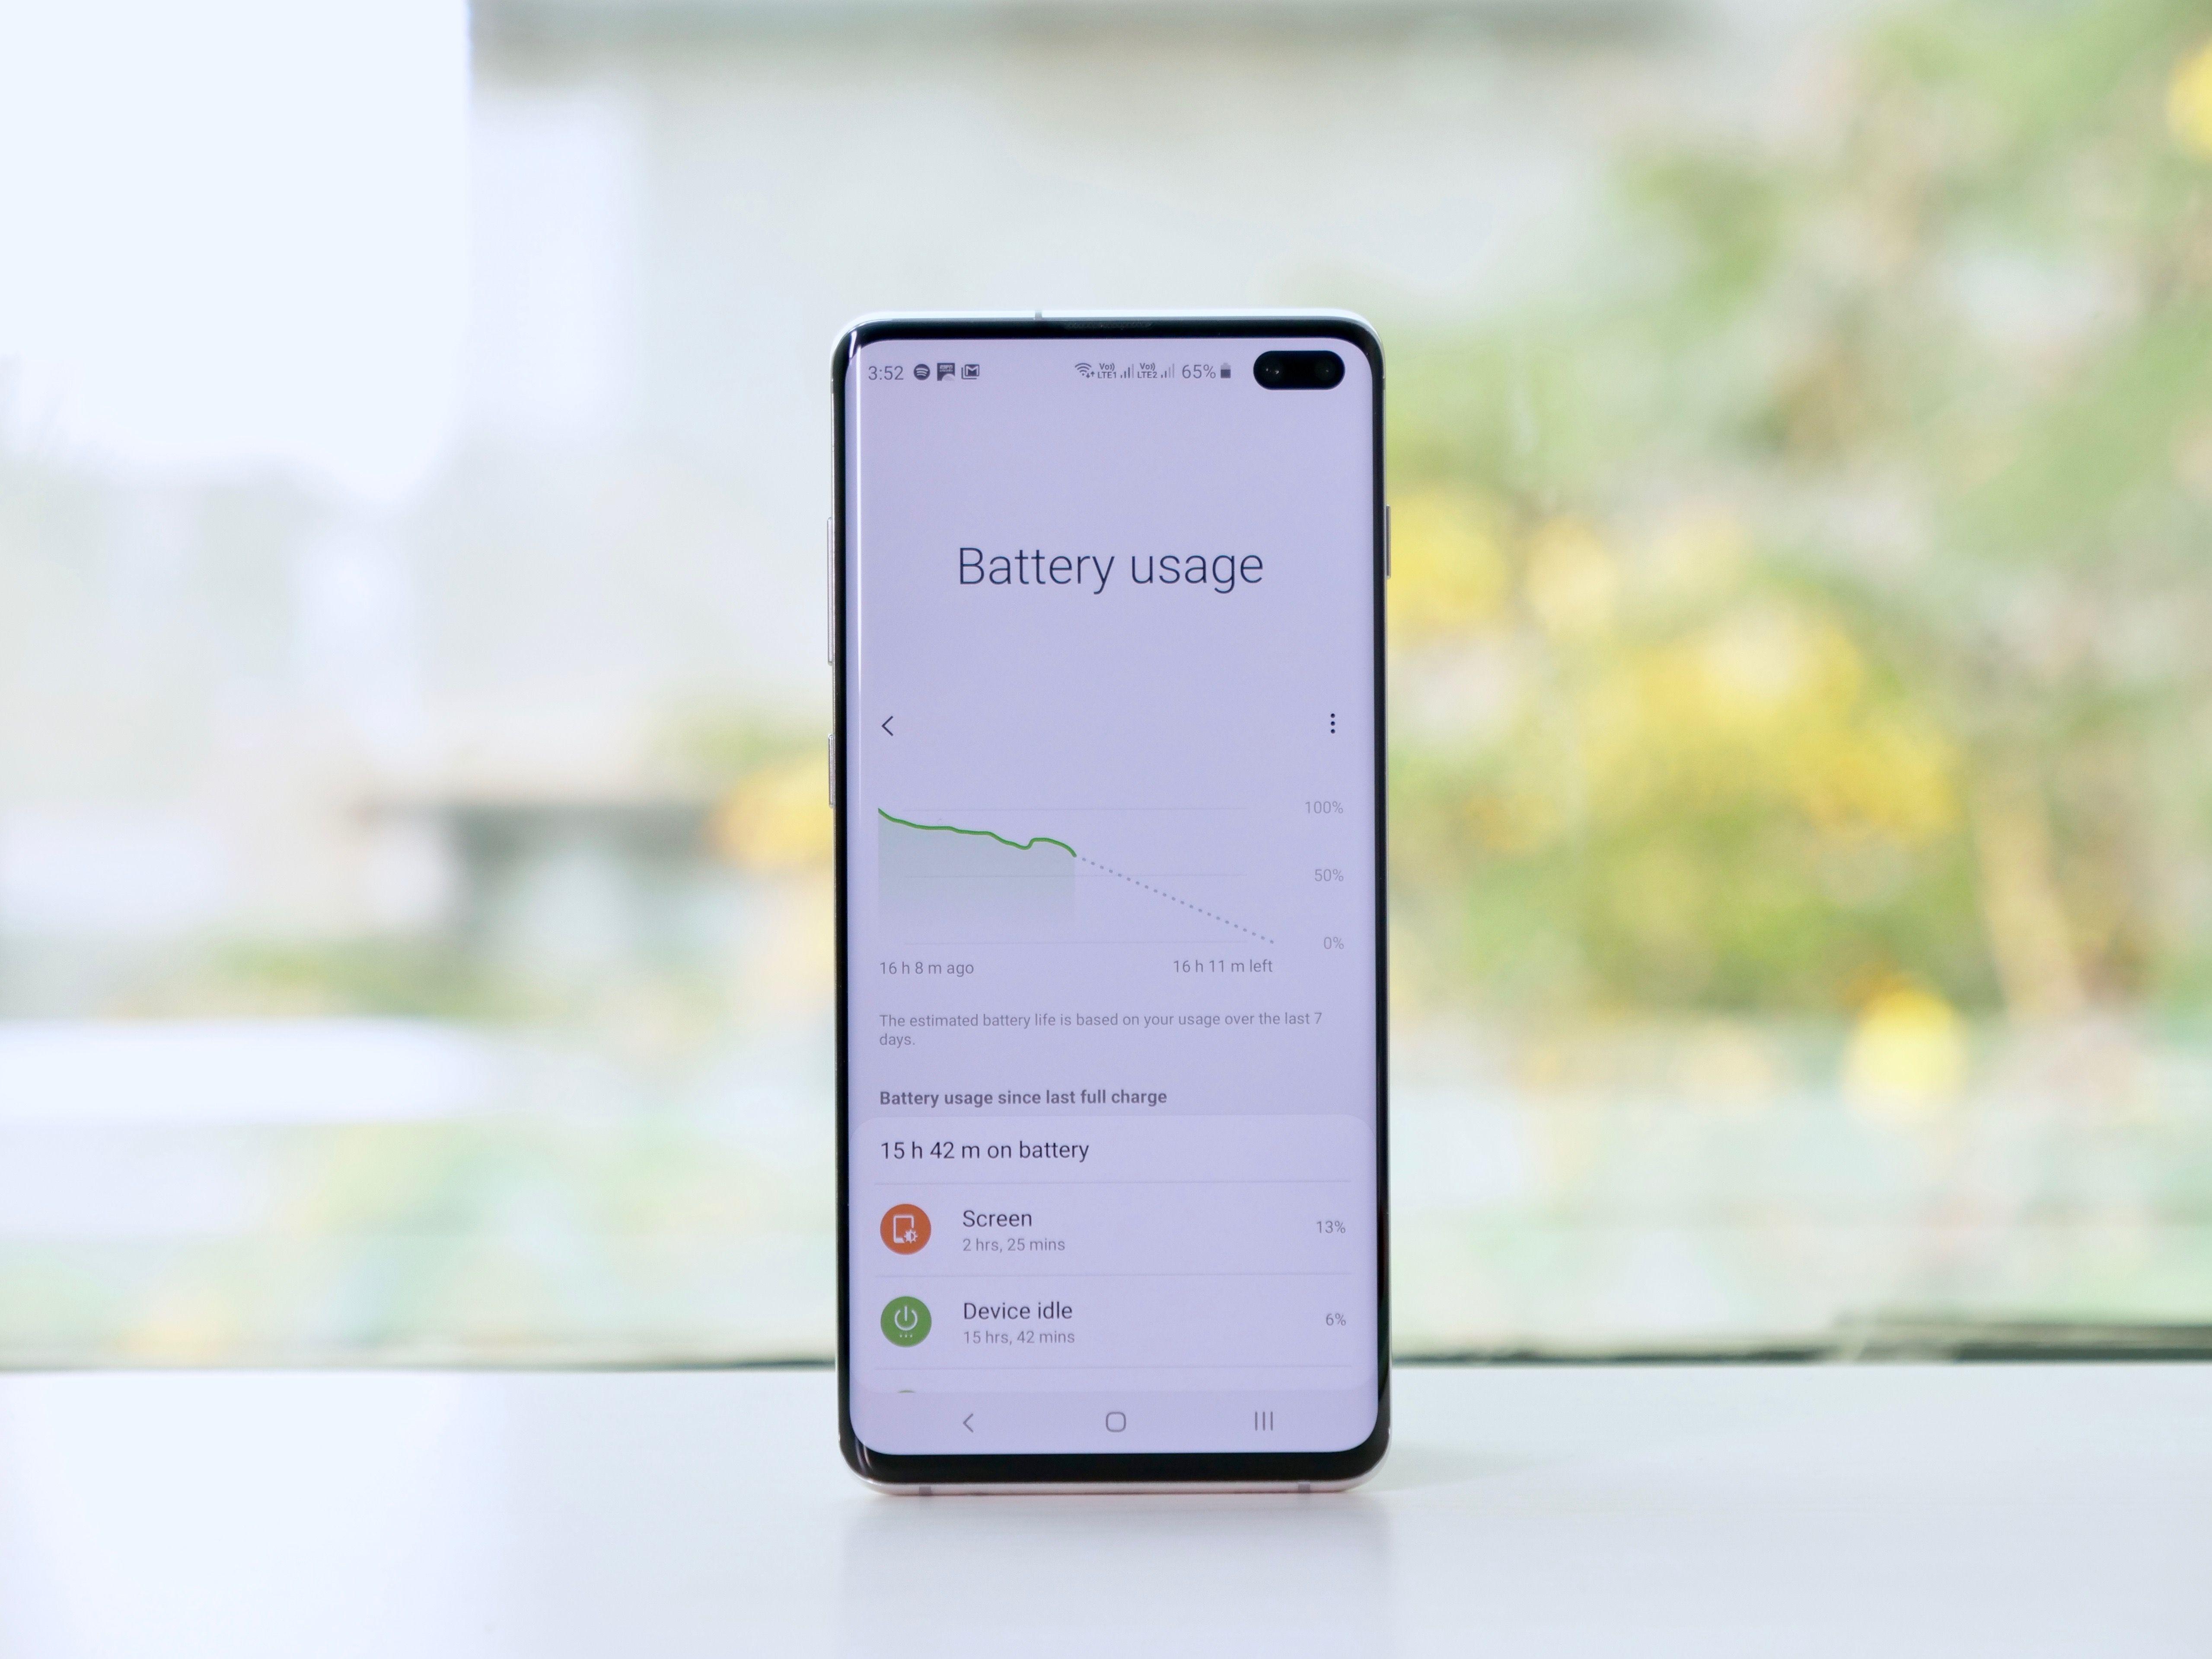 Samsung Galaxy S10 Plus Battery Life Performance